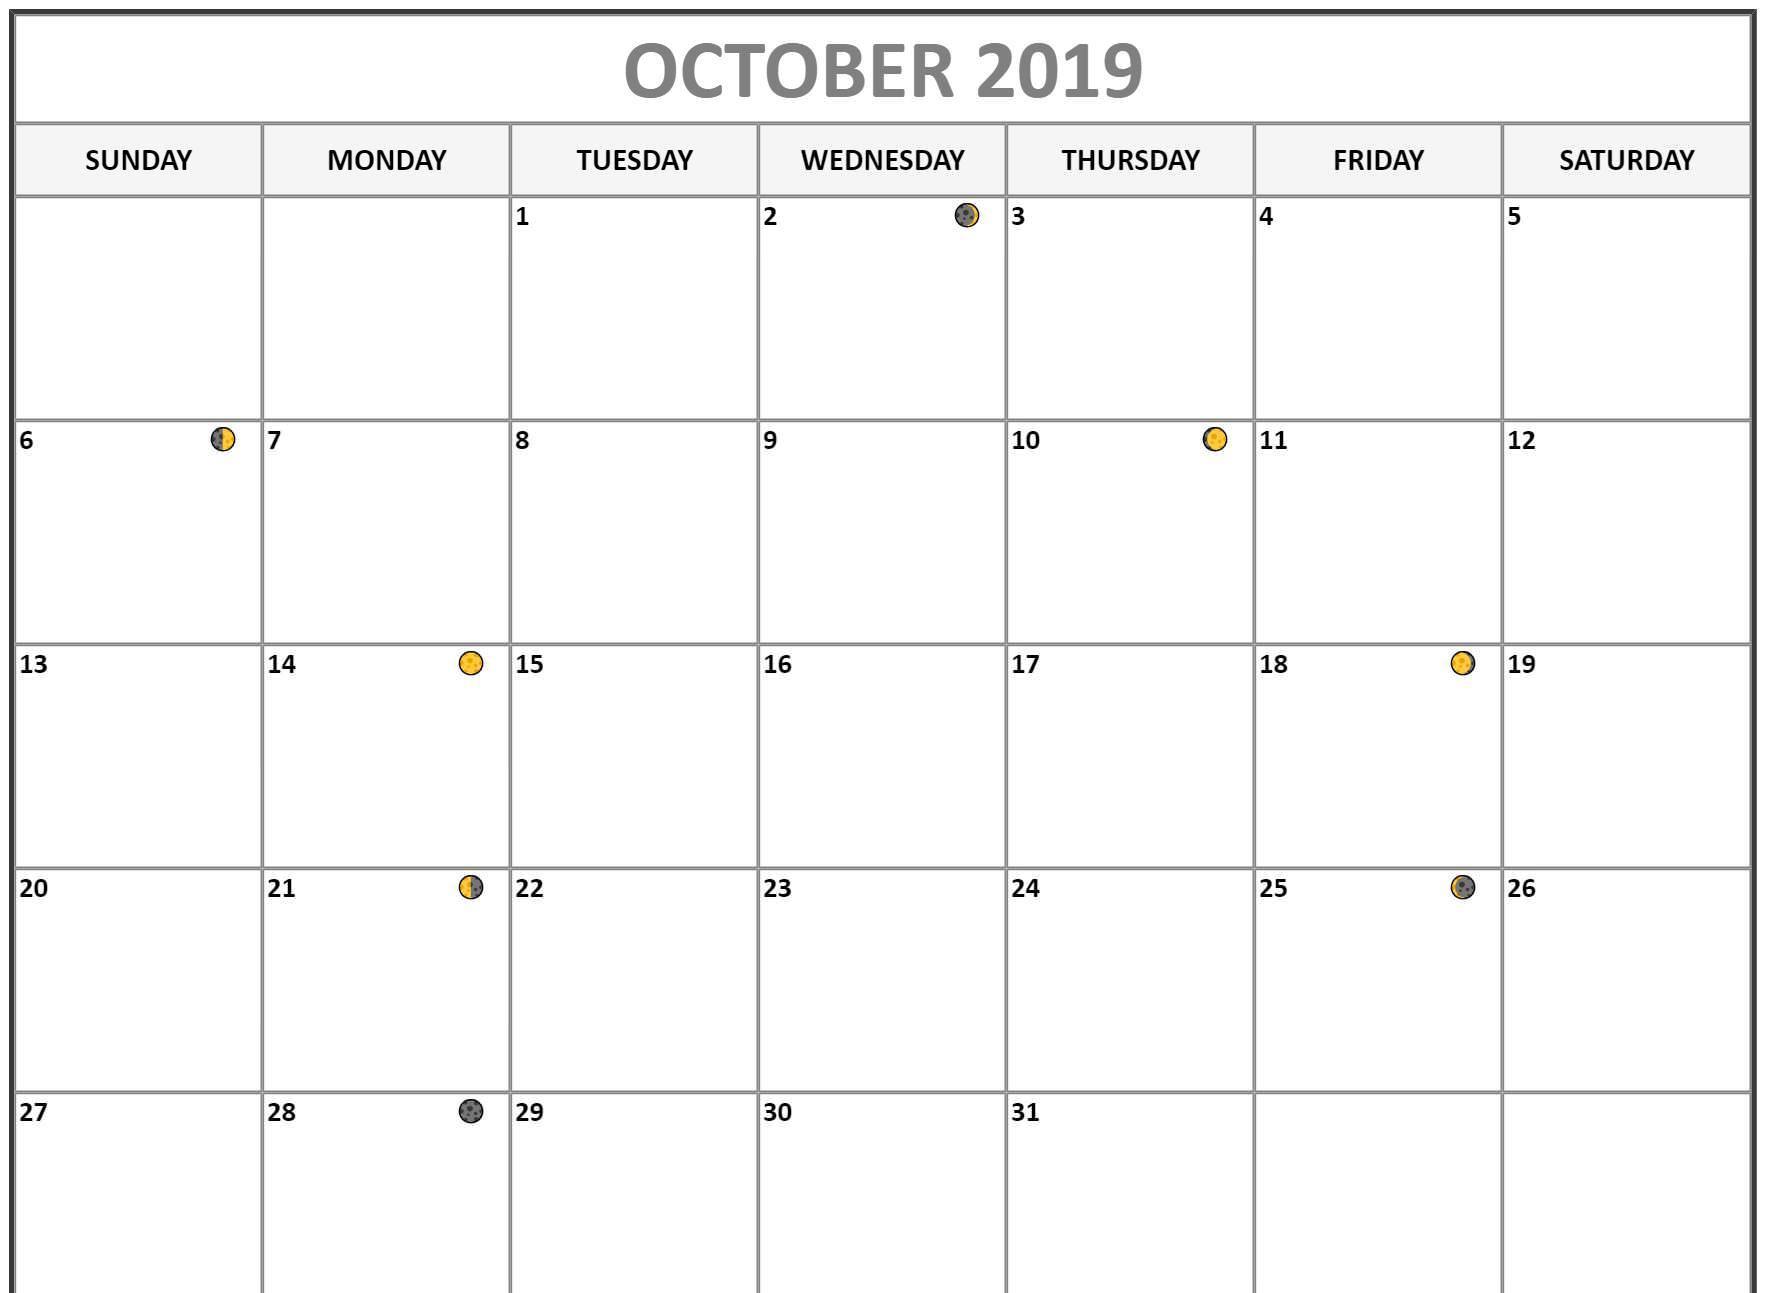 October 2019 Lunar Calendar